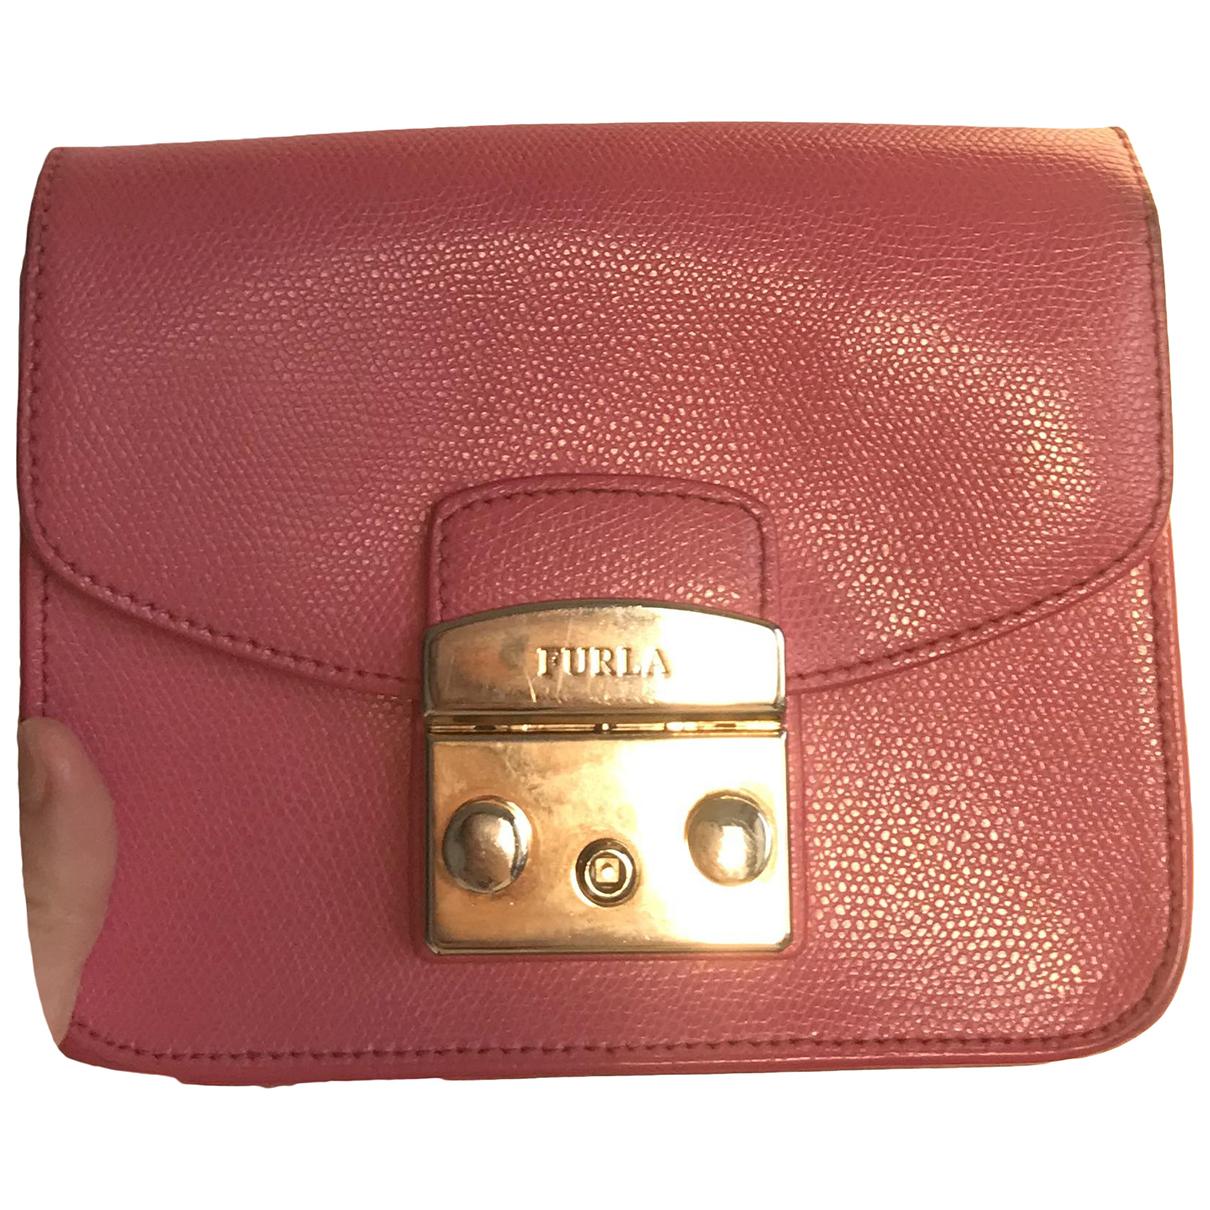 Furla - Sac a main Metropolis pour femme en cuir verni - rose